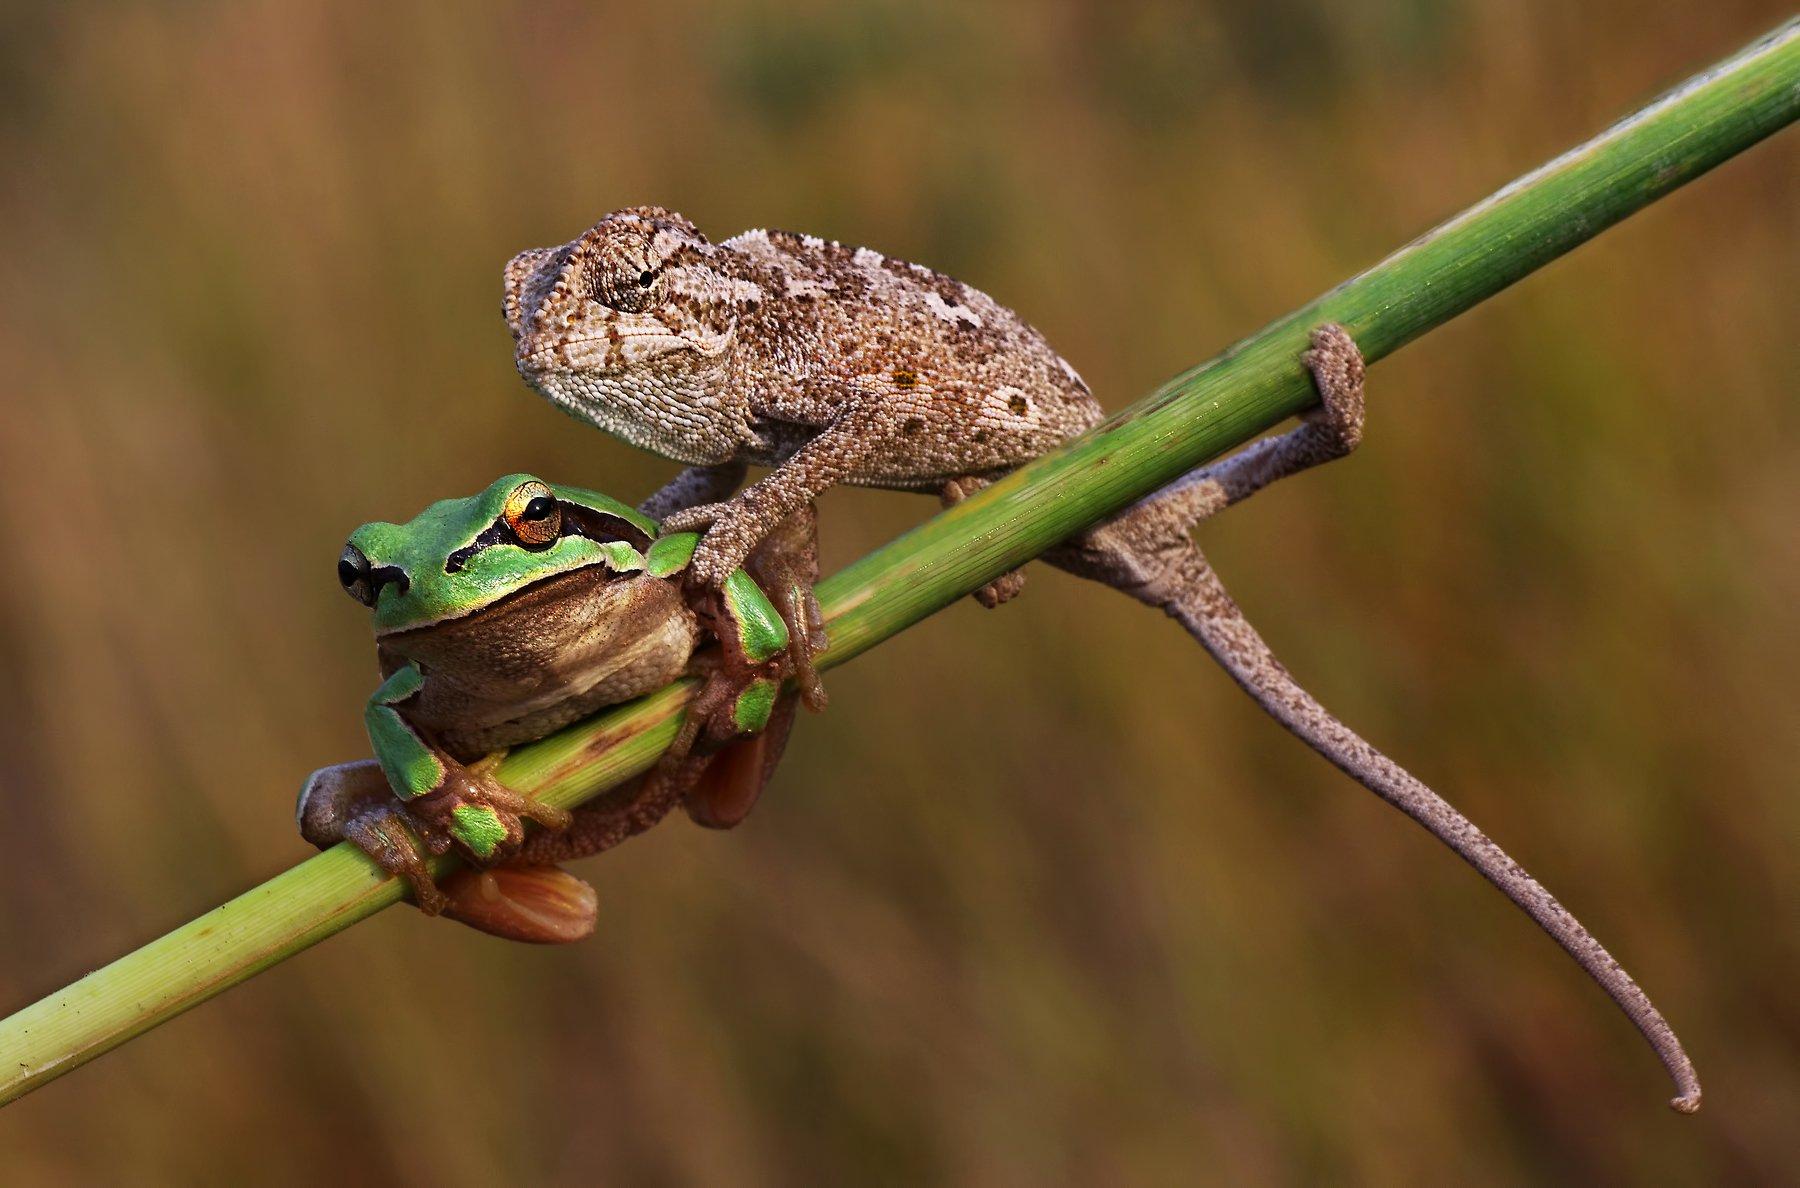 animal, nature, macro, frog, chameleon, friendship, selfie, Savas Sener